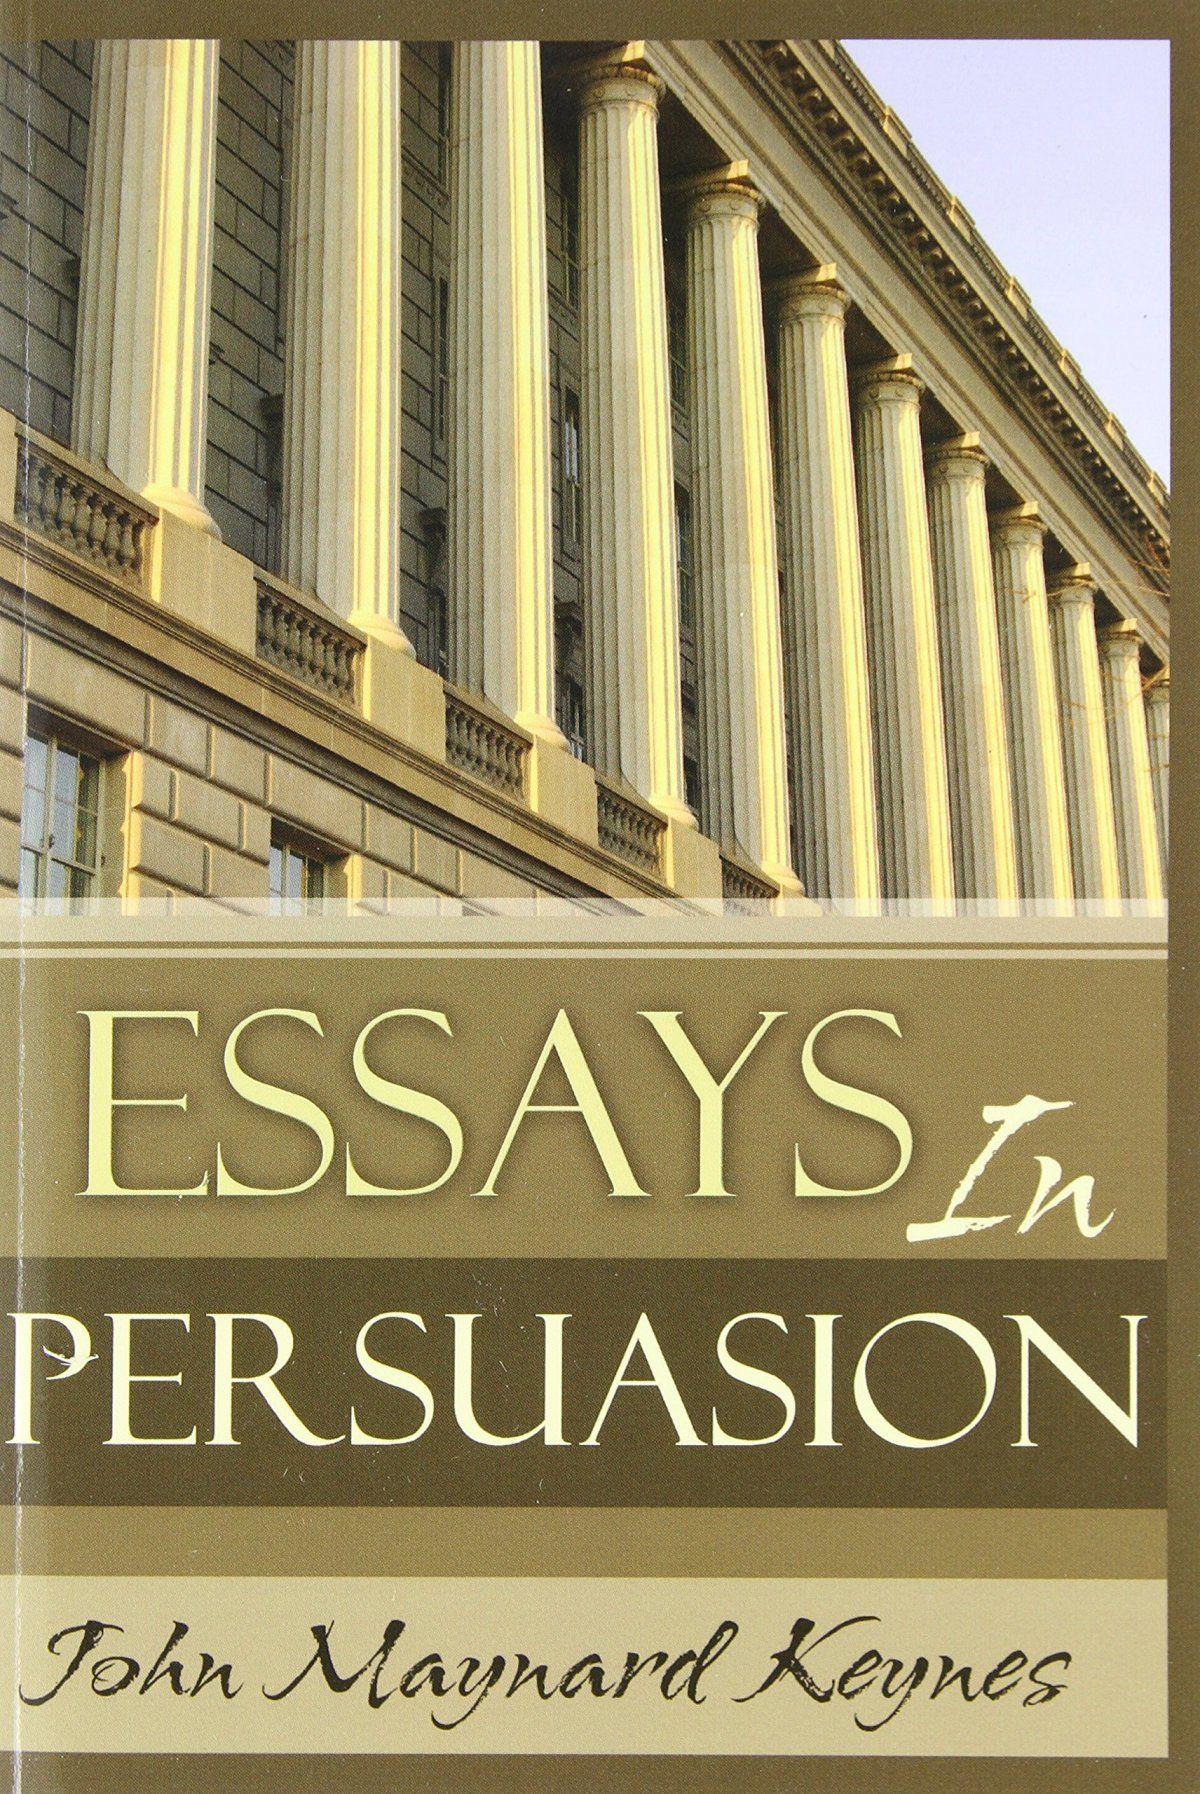 003 Essays In Persuasion Essay Remarkable Audiobook Pdf John Maynard Keynes Summary Full